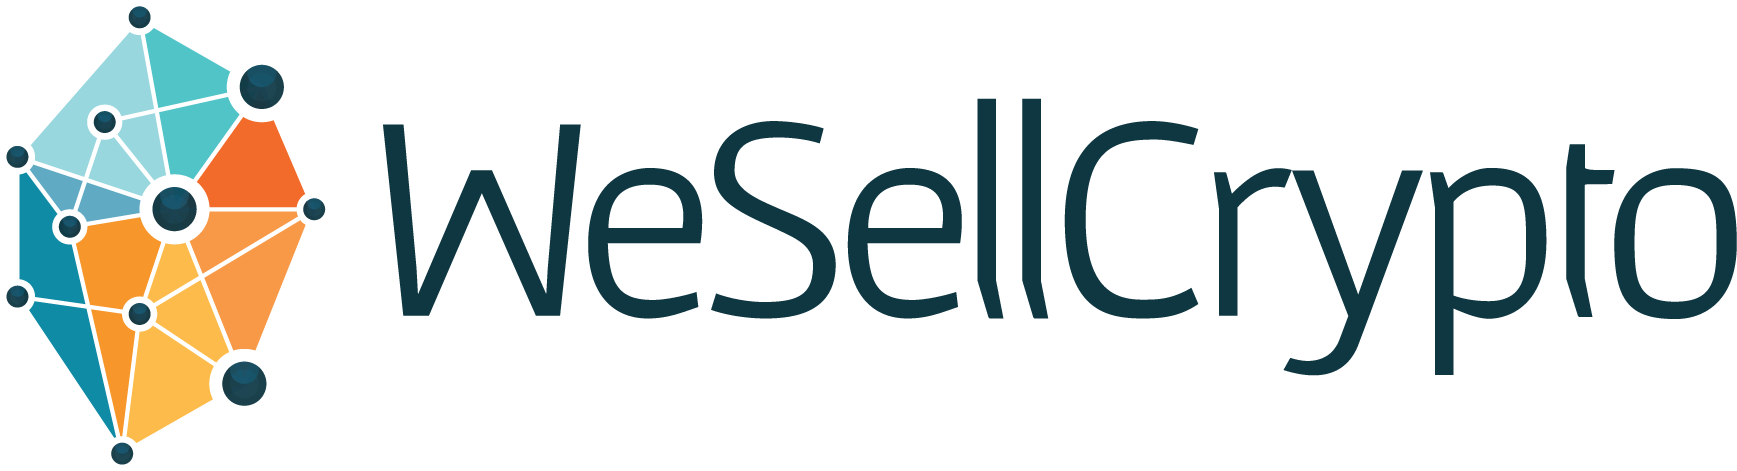 WeSellCrypto logo